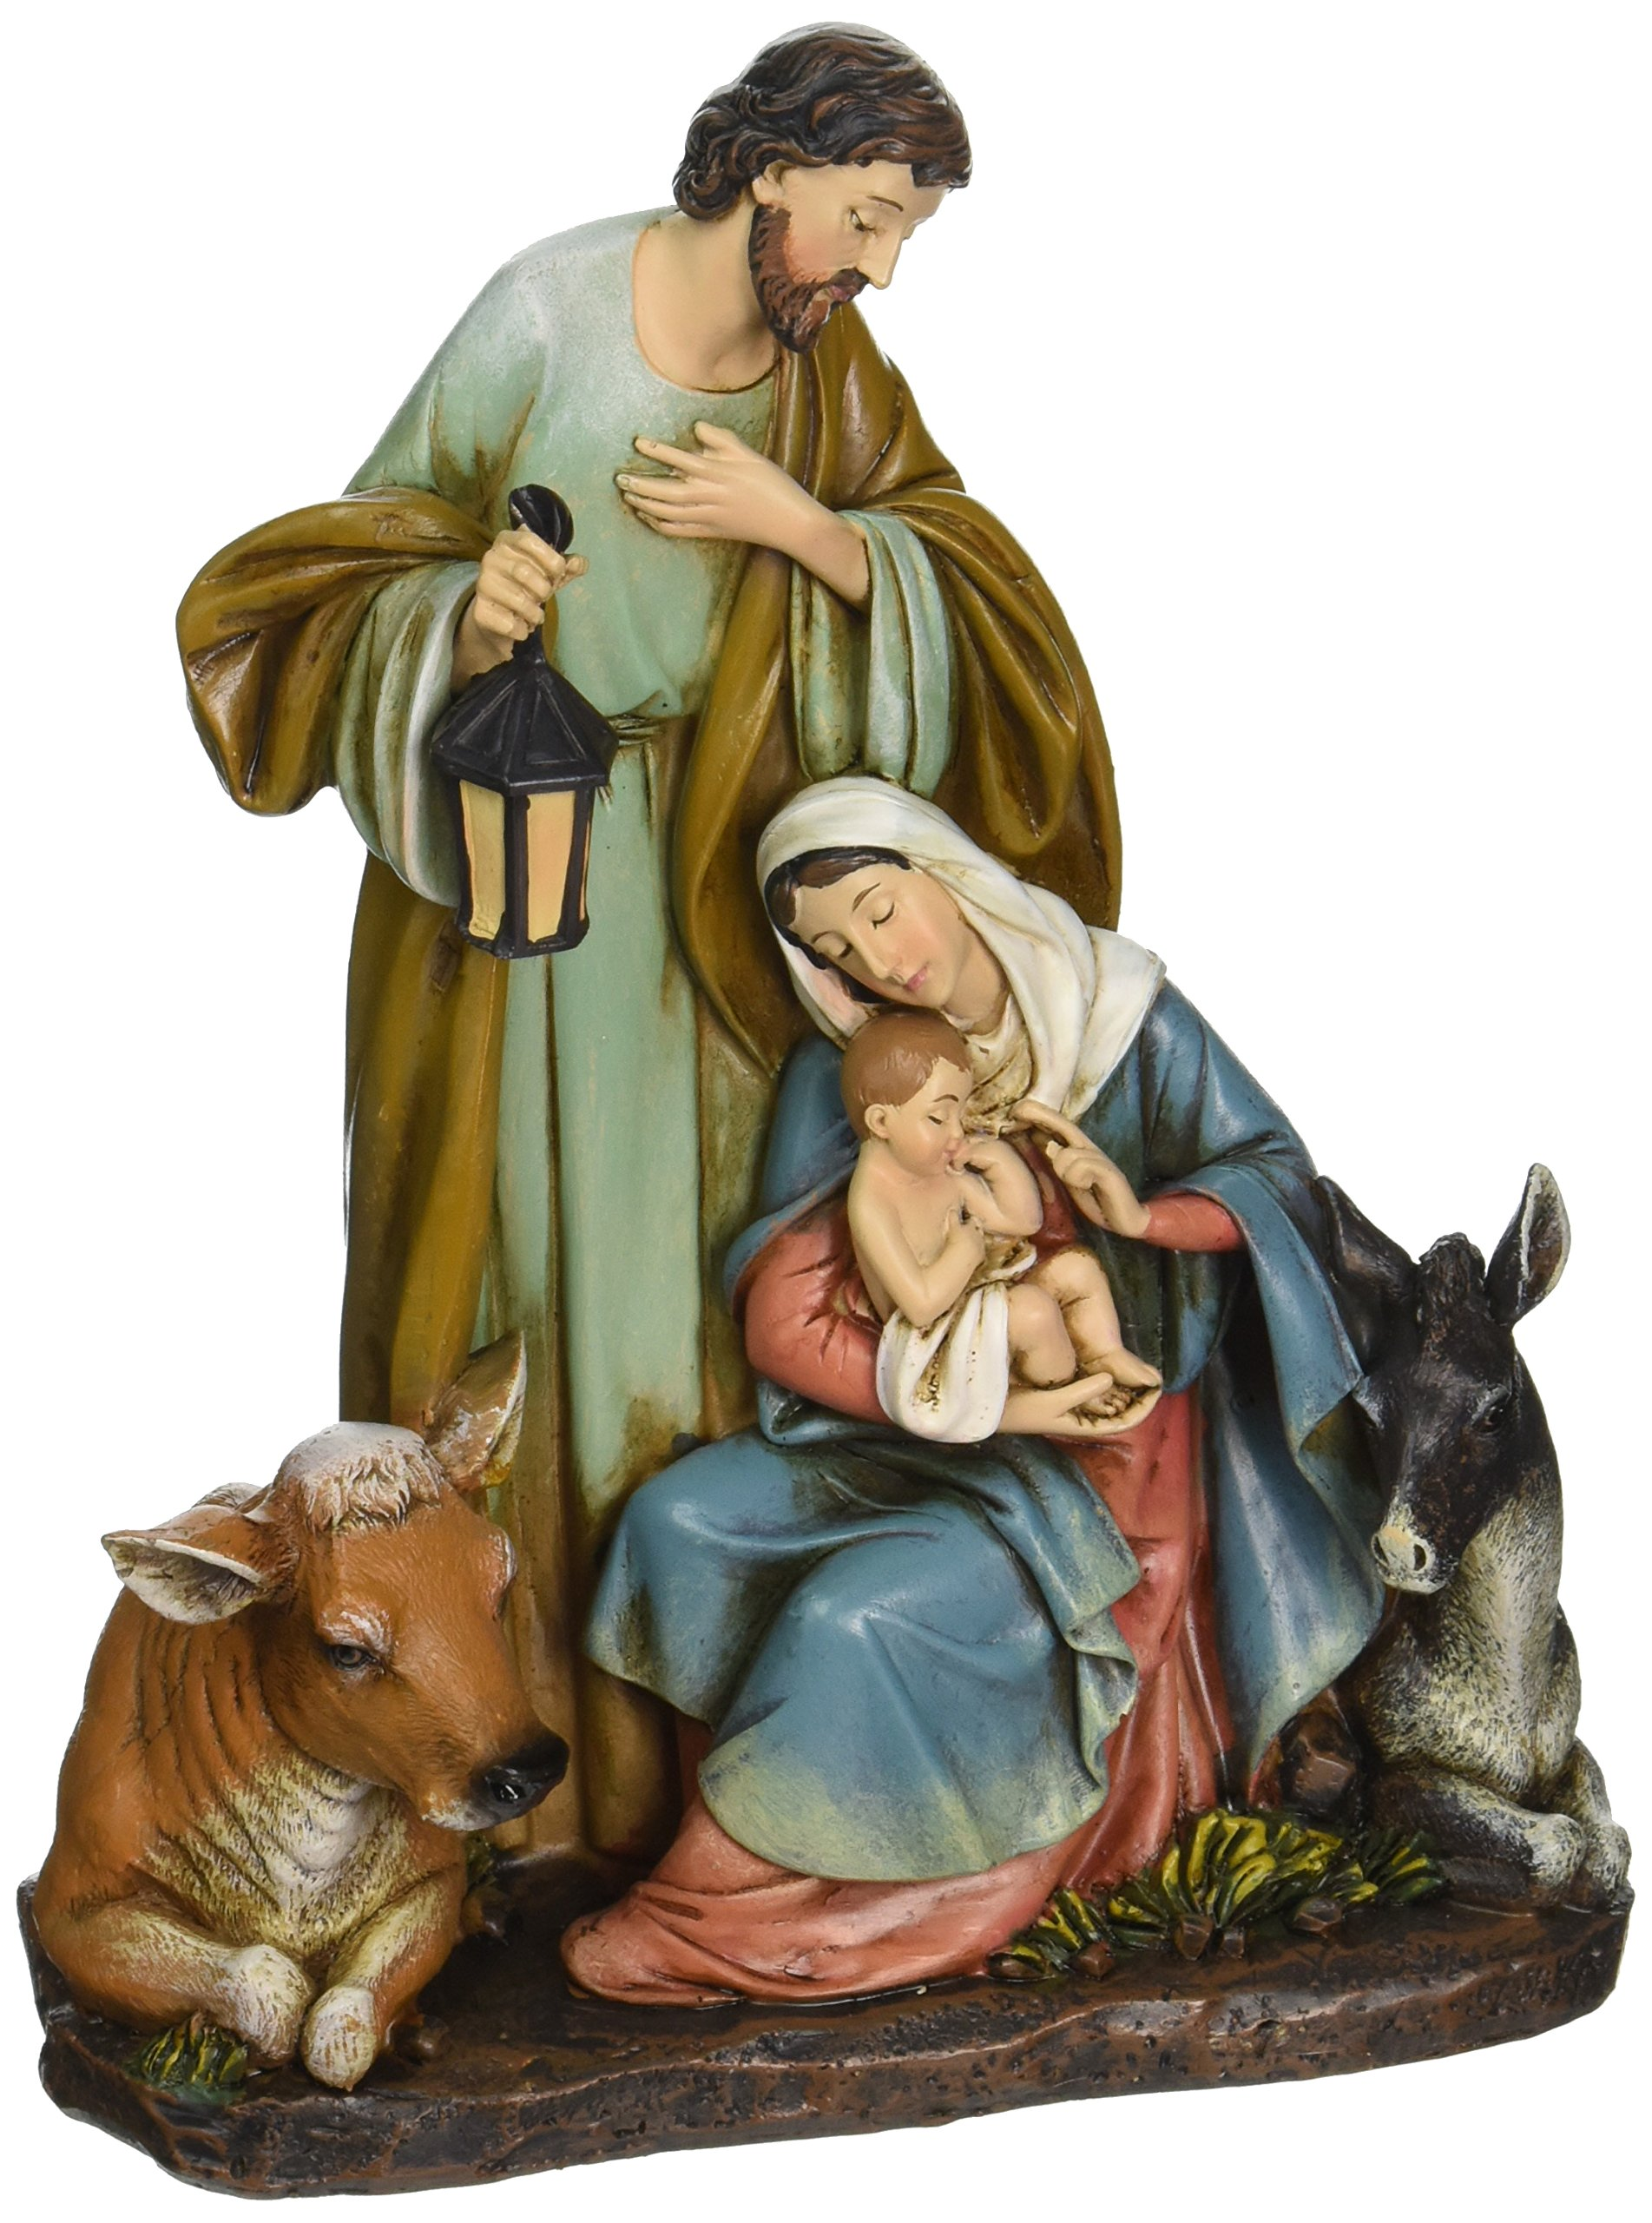 Roman Josephs Studio Slim Profile Holy Family with Barn Animals Figurine, 7.5-Inch